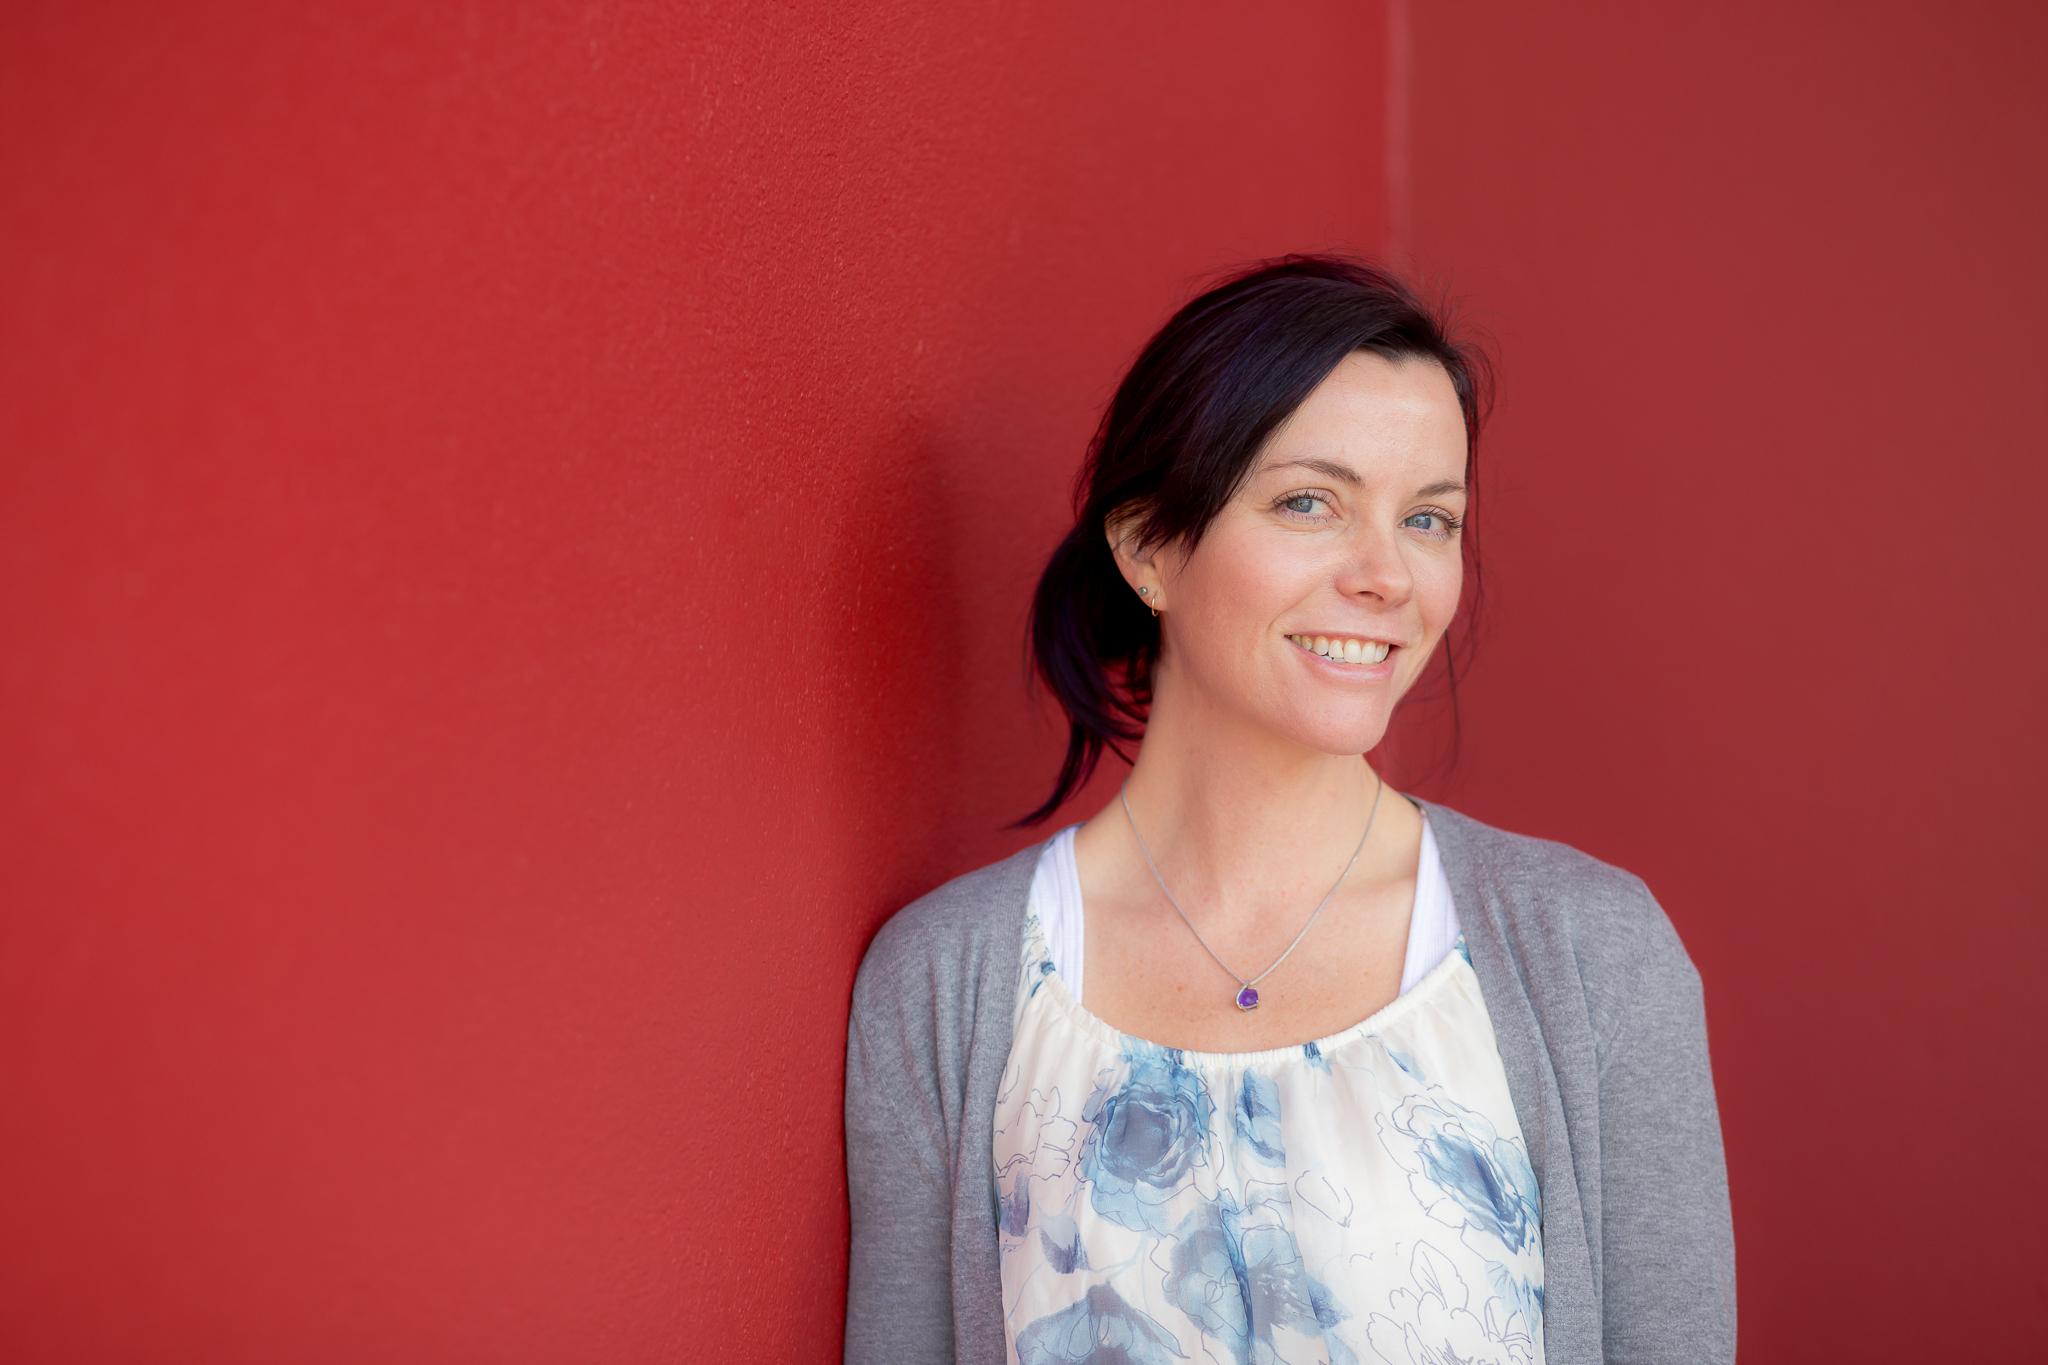 Jordana's Massage Therapist Business Profile